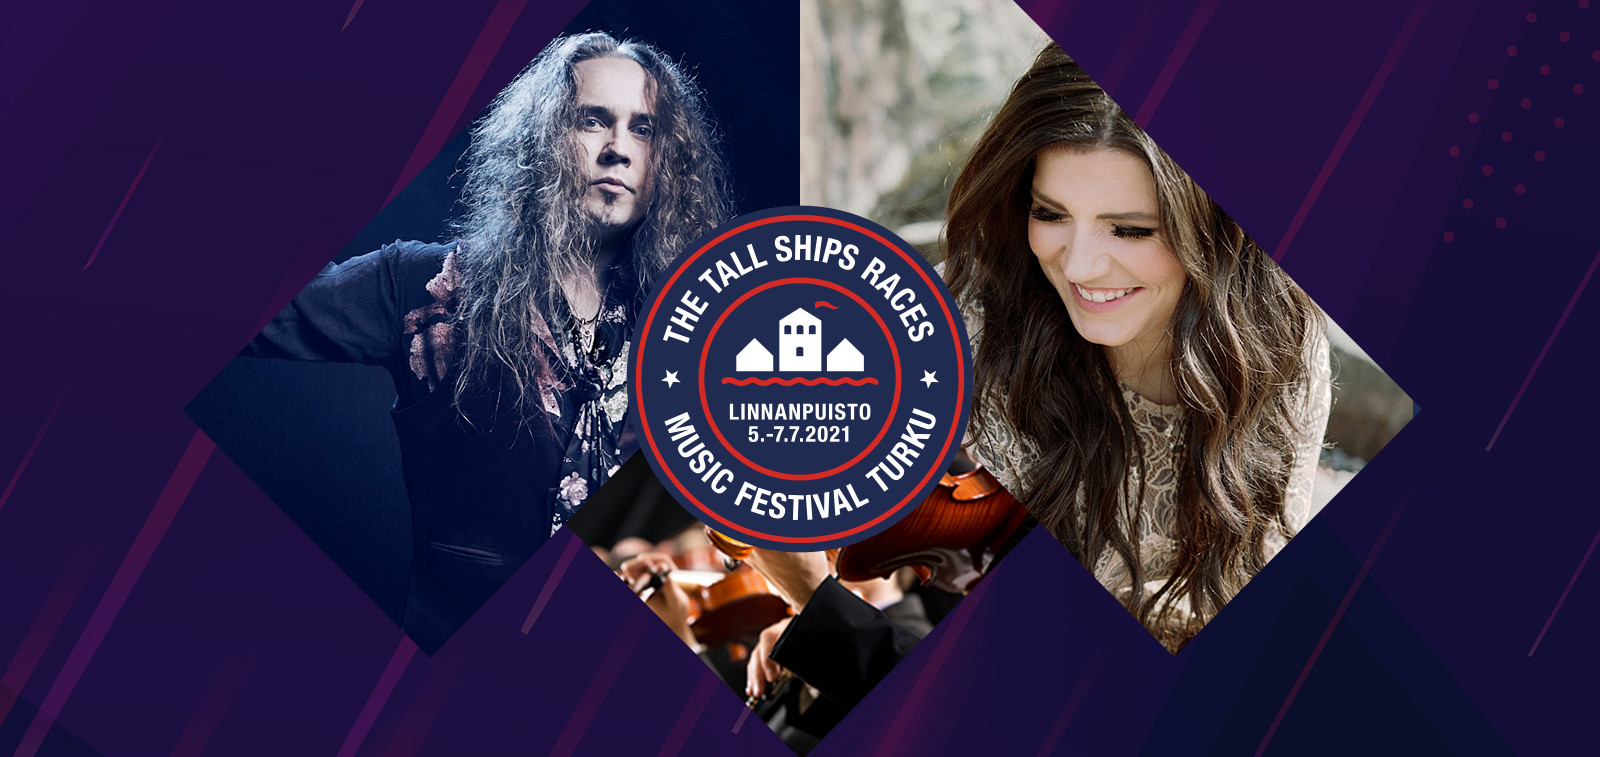 Tall Ships Races Music Festival 2021